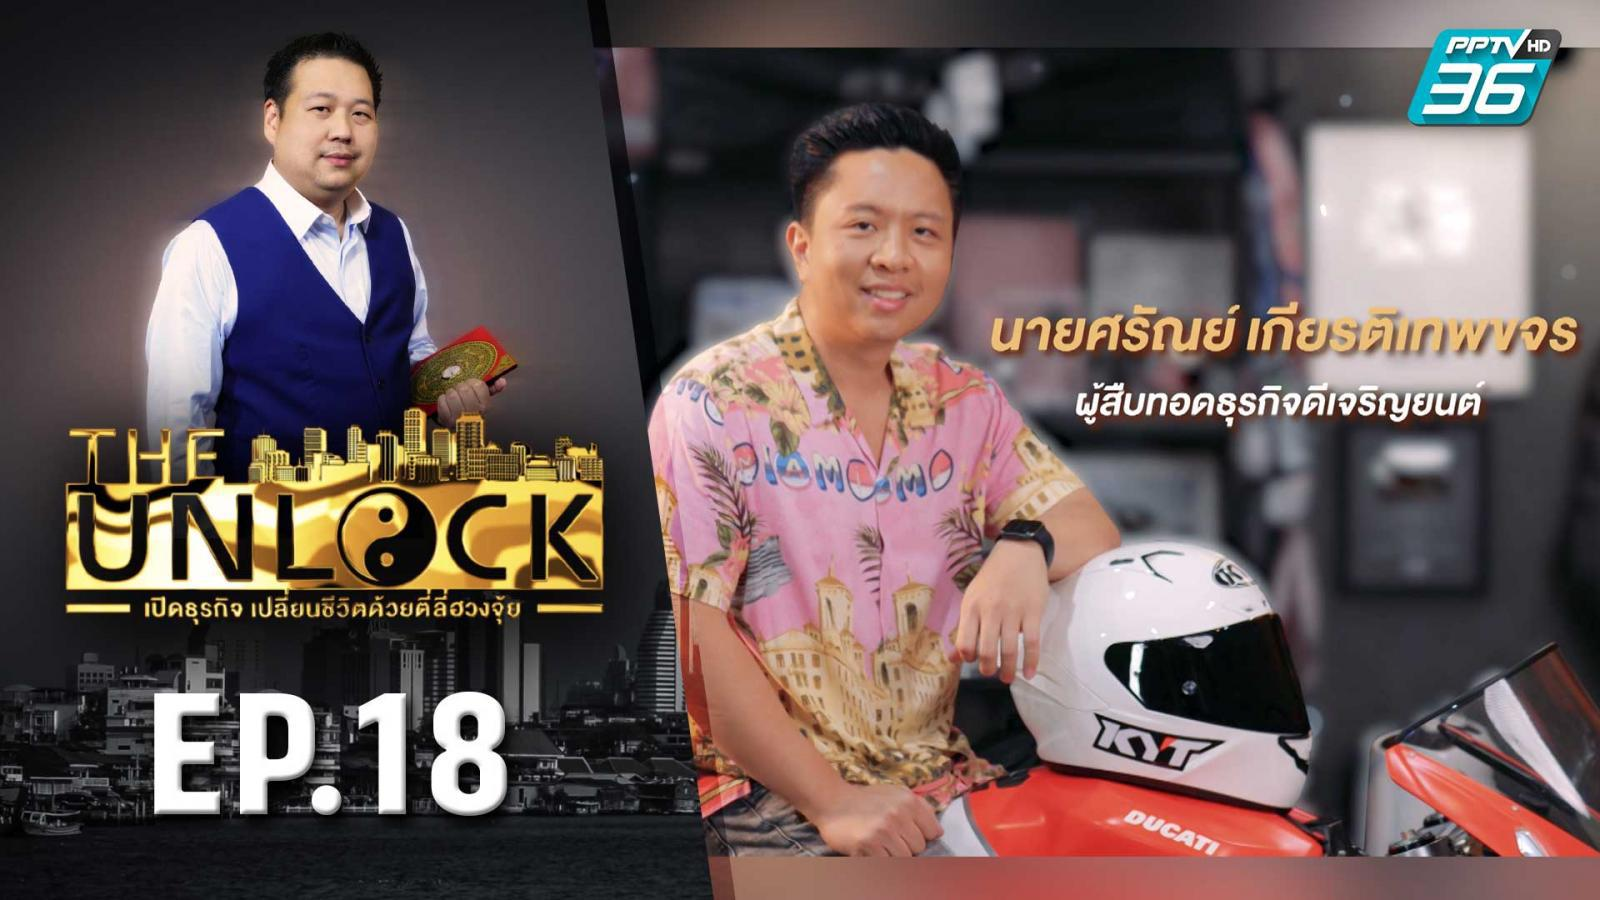 The Unlock เปิดธุรกิจ เปลี่ยนชีวิตด้วยตี่ลี่ฮวงจุ้ย | ดีเจริญยนต์ EP.18 | PPTVHD 36